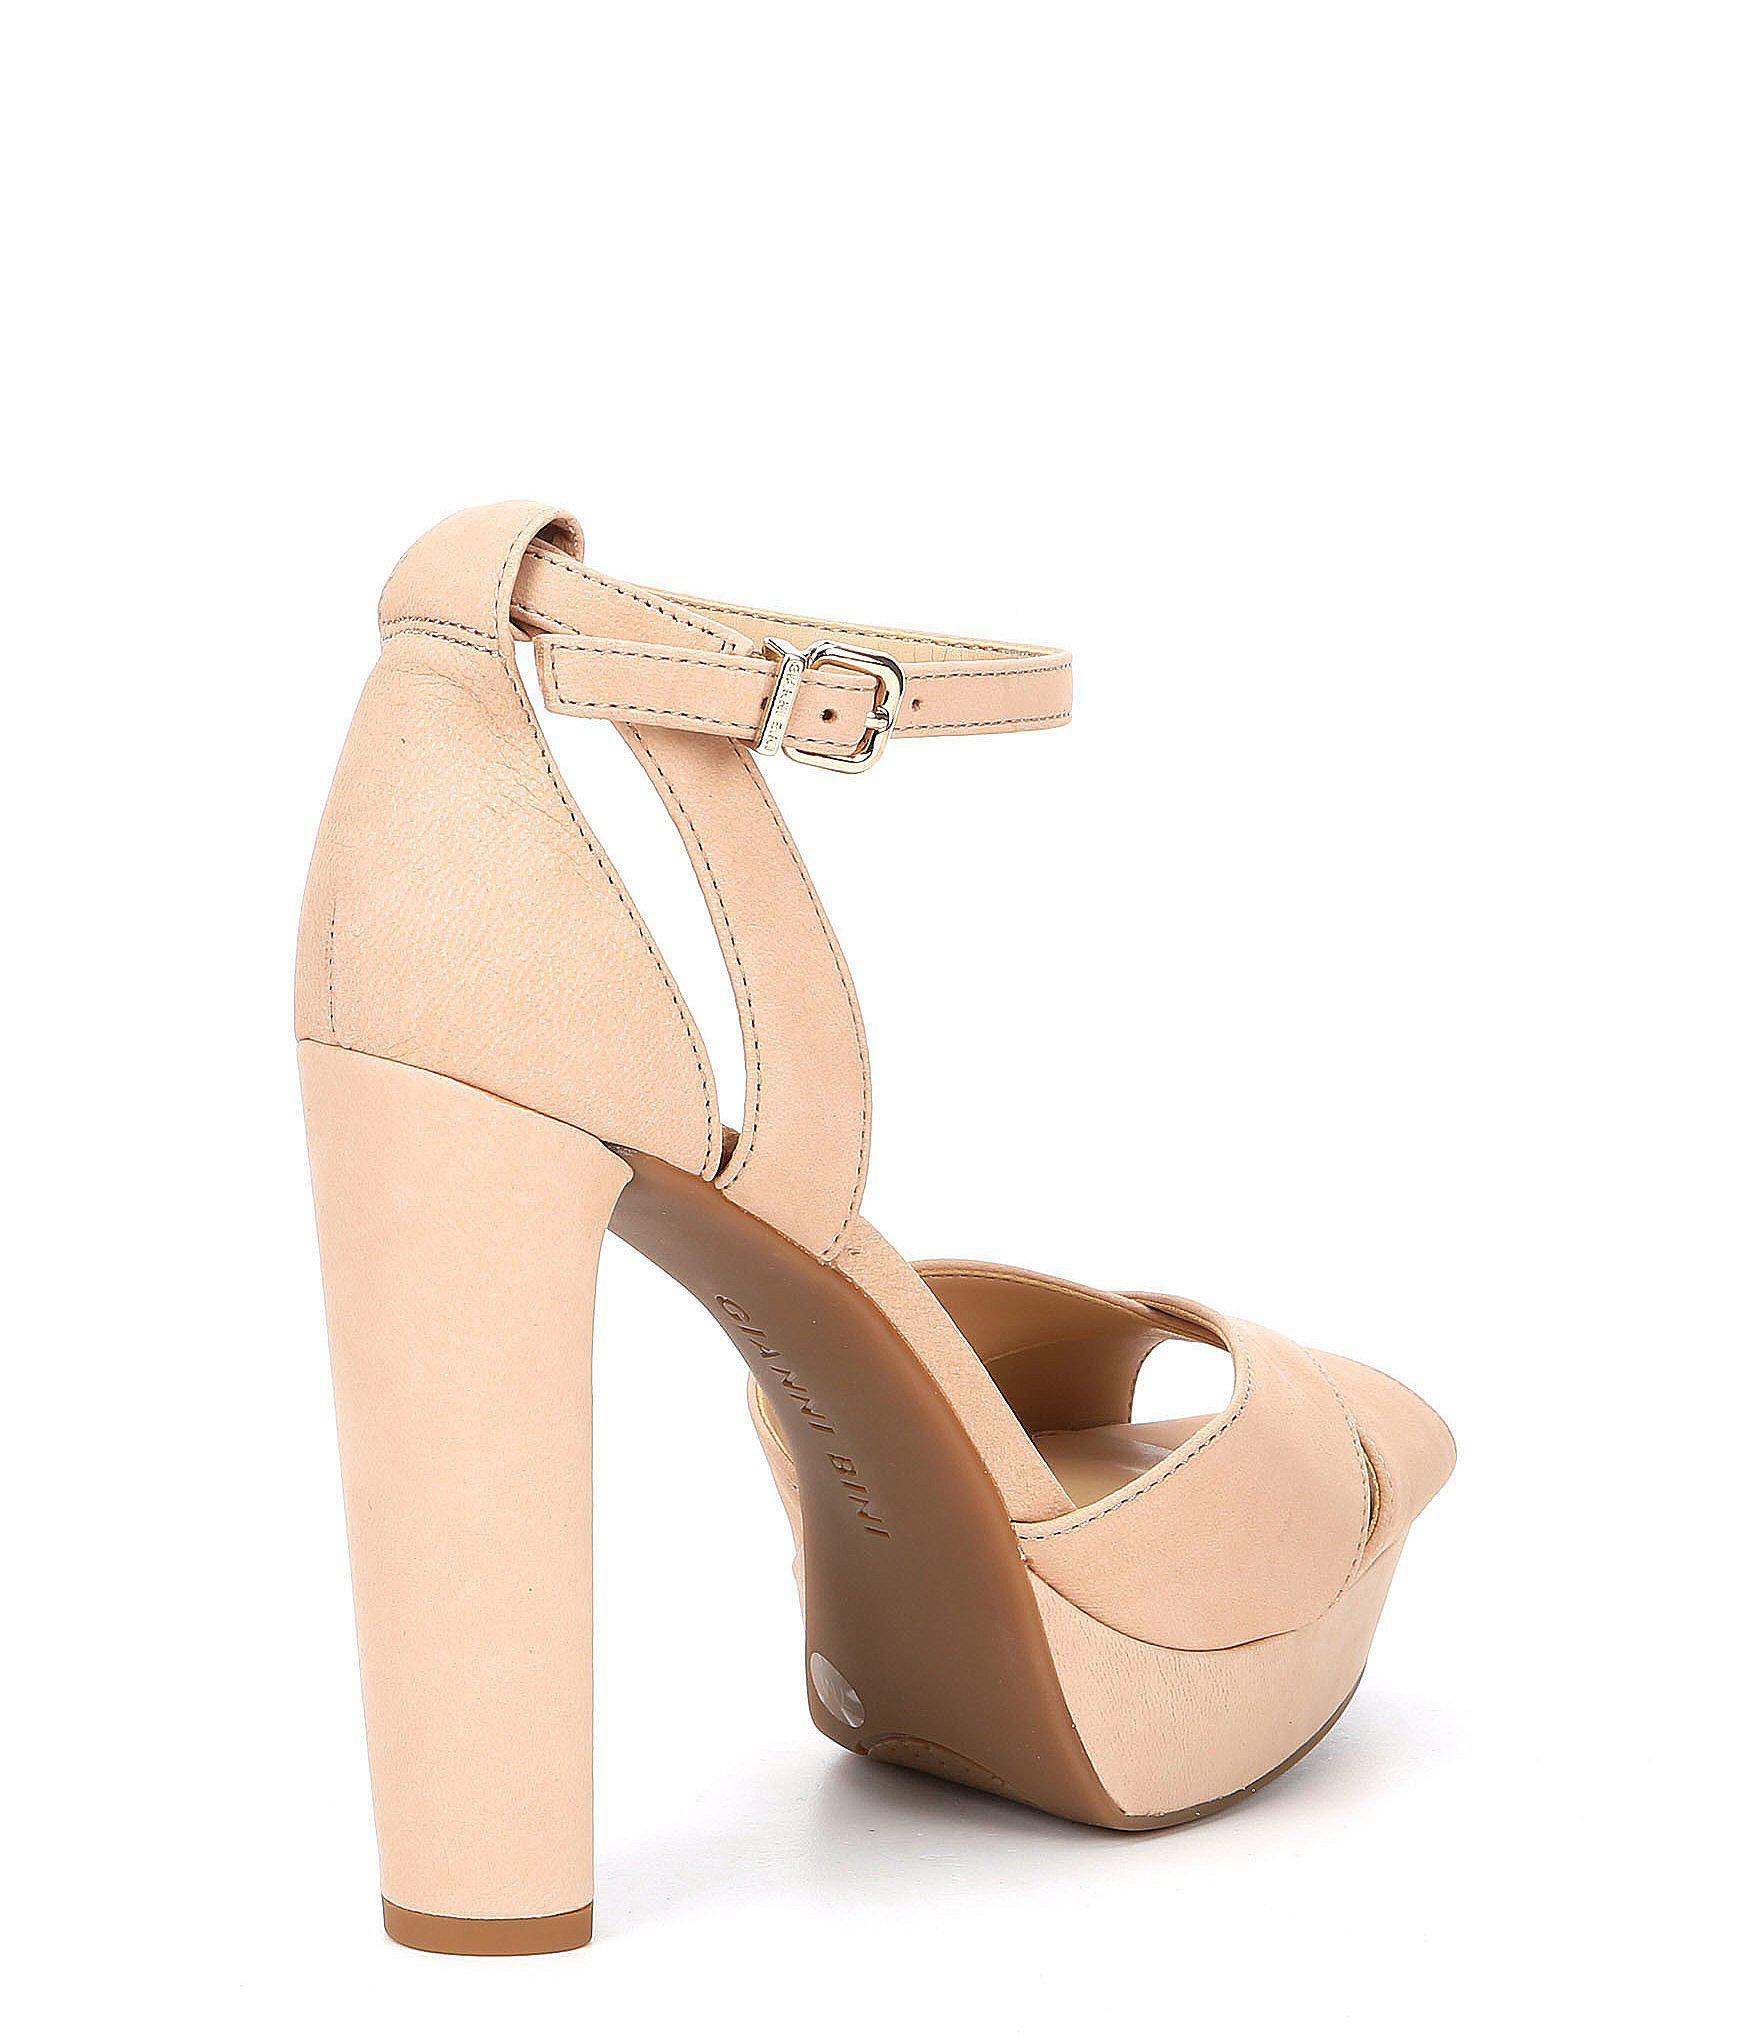 9b7b972085 Gianni Bini Lydianne Nubuck Platform Dress Sandals in Natural - Lyst